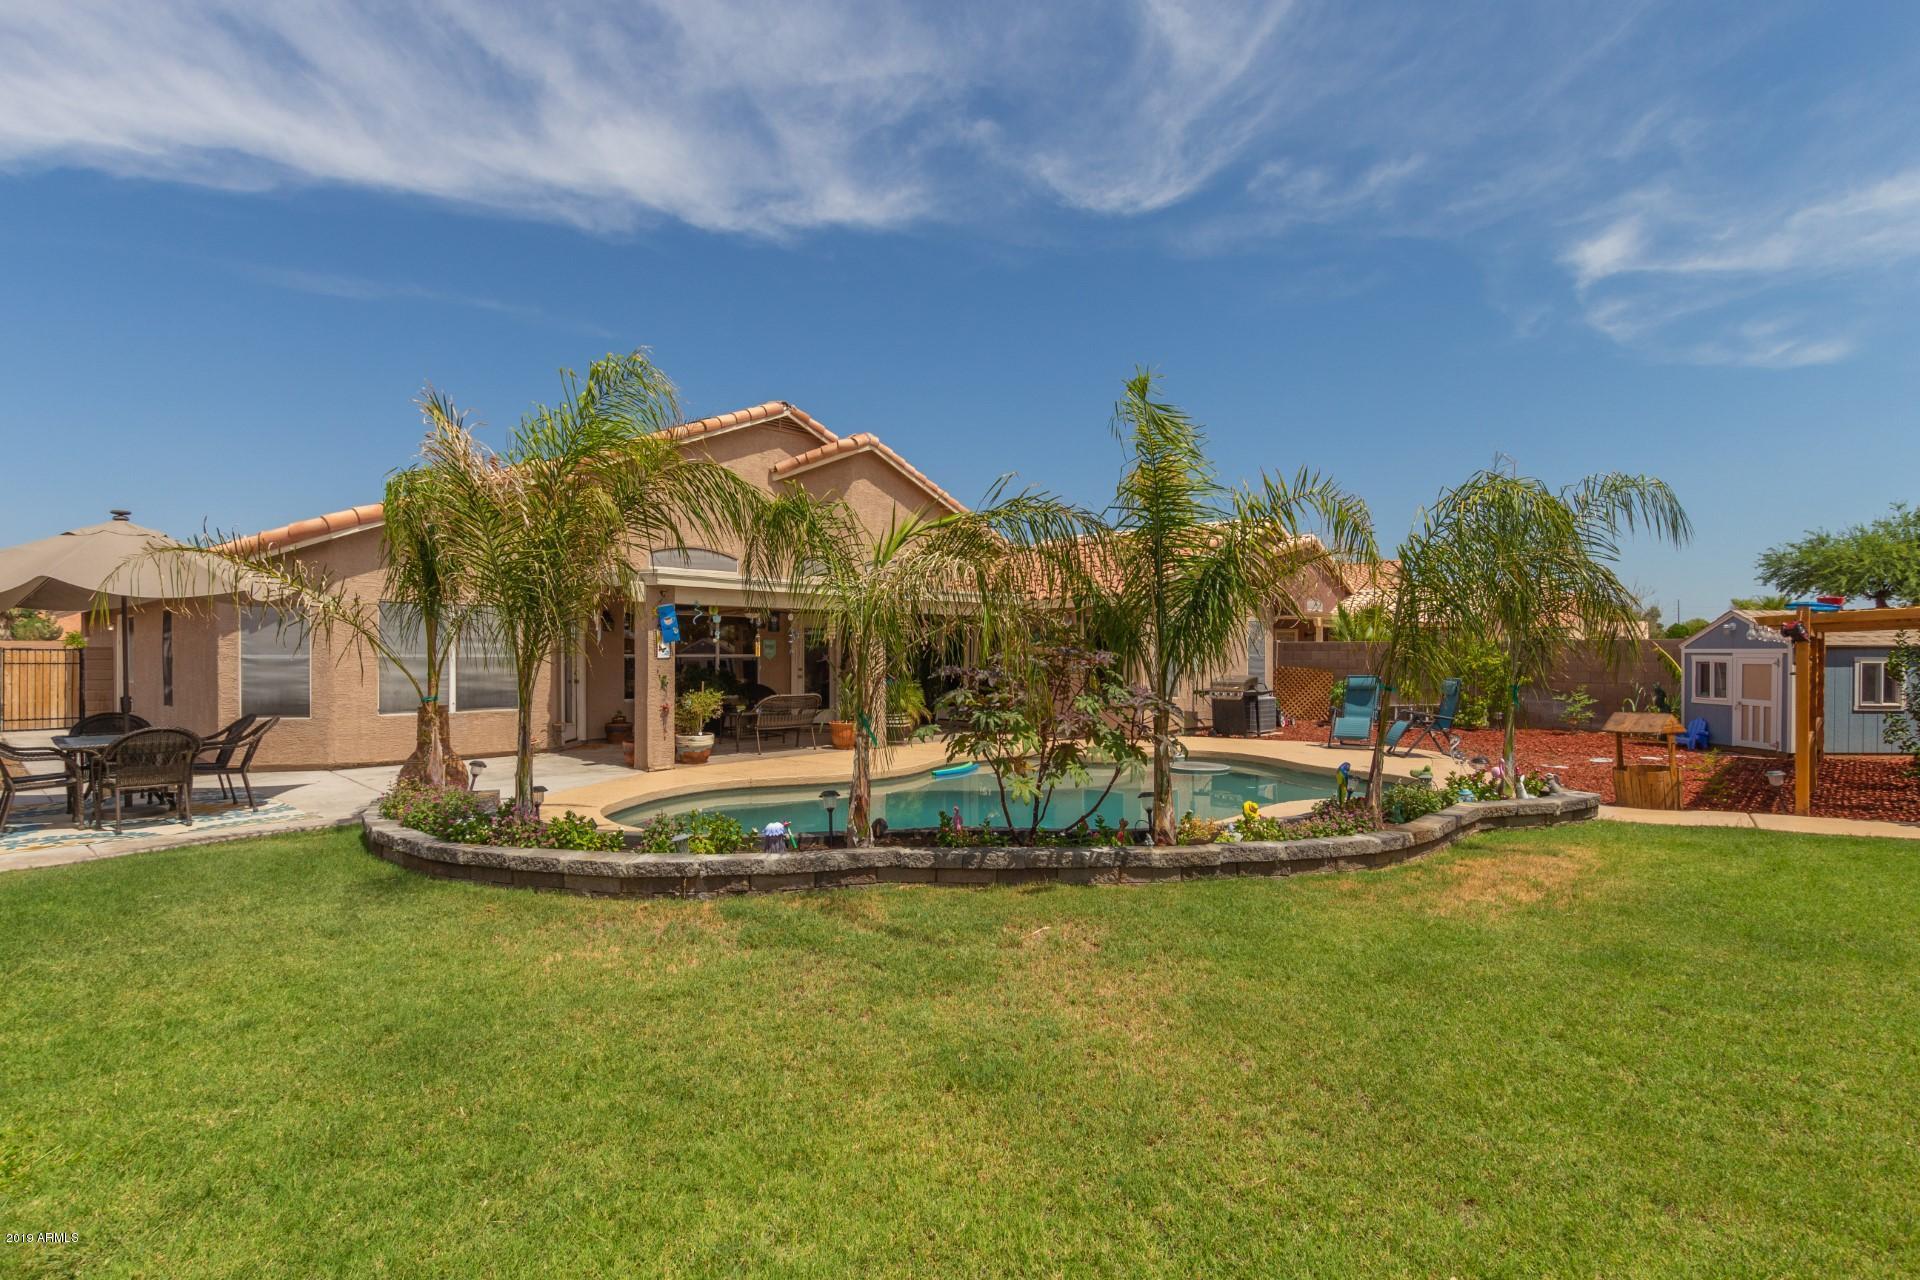 MLS 5954796 2409 N 123RD Avenue, Avondale, AZ 85392 Avondale AZ Three Bedroom